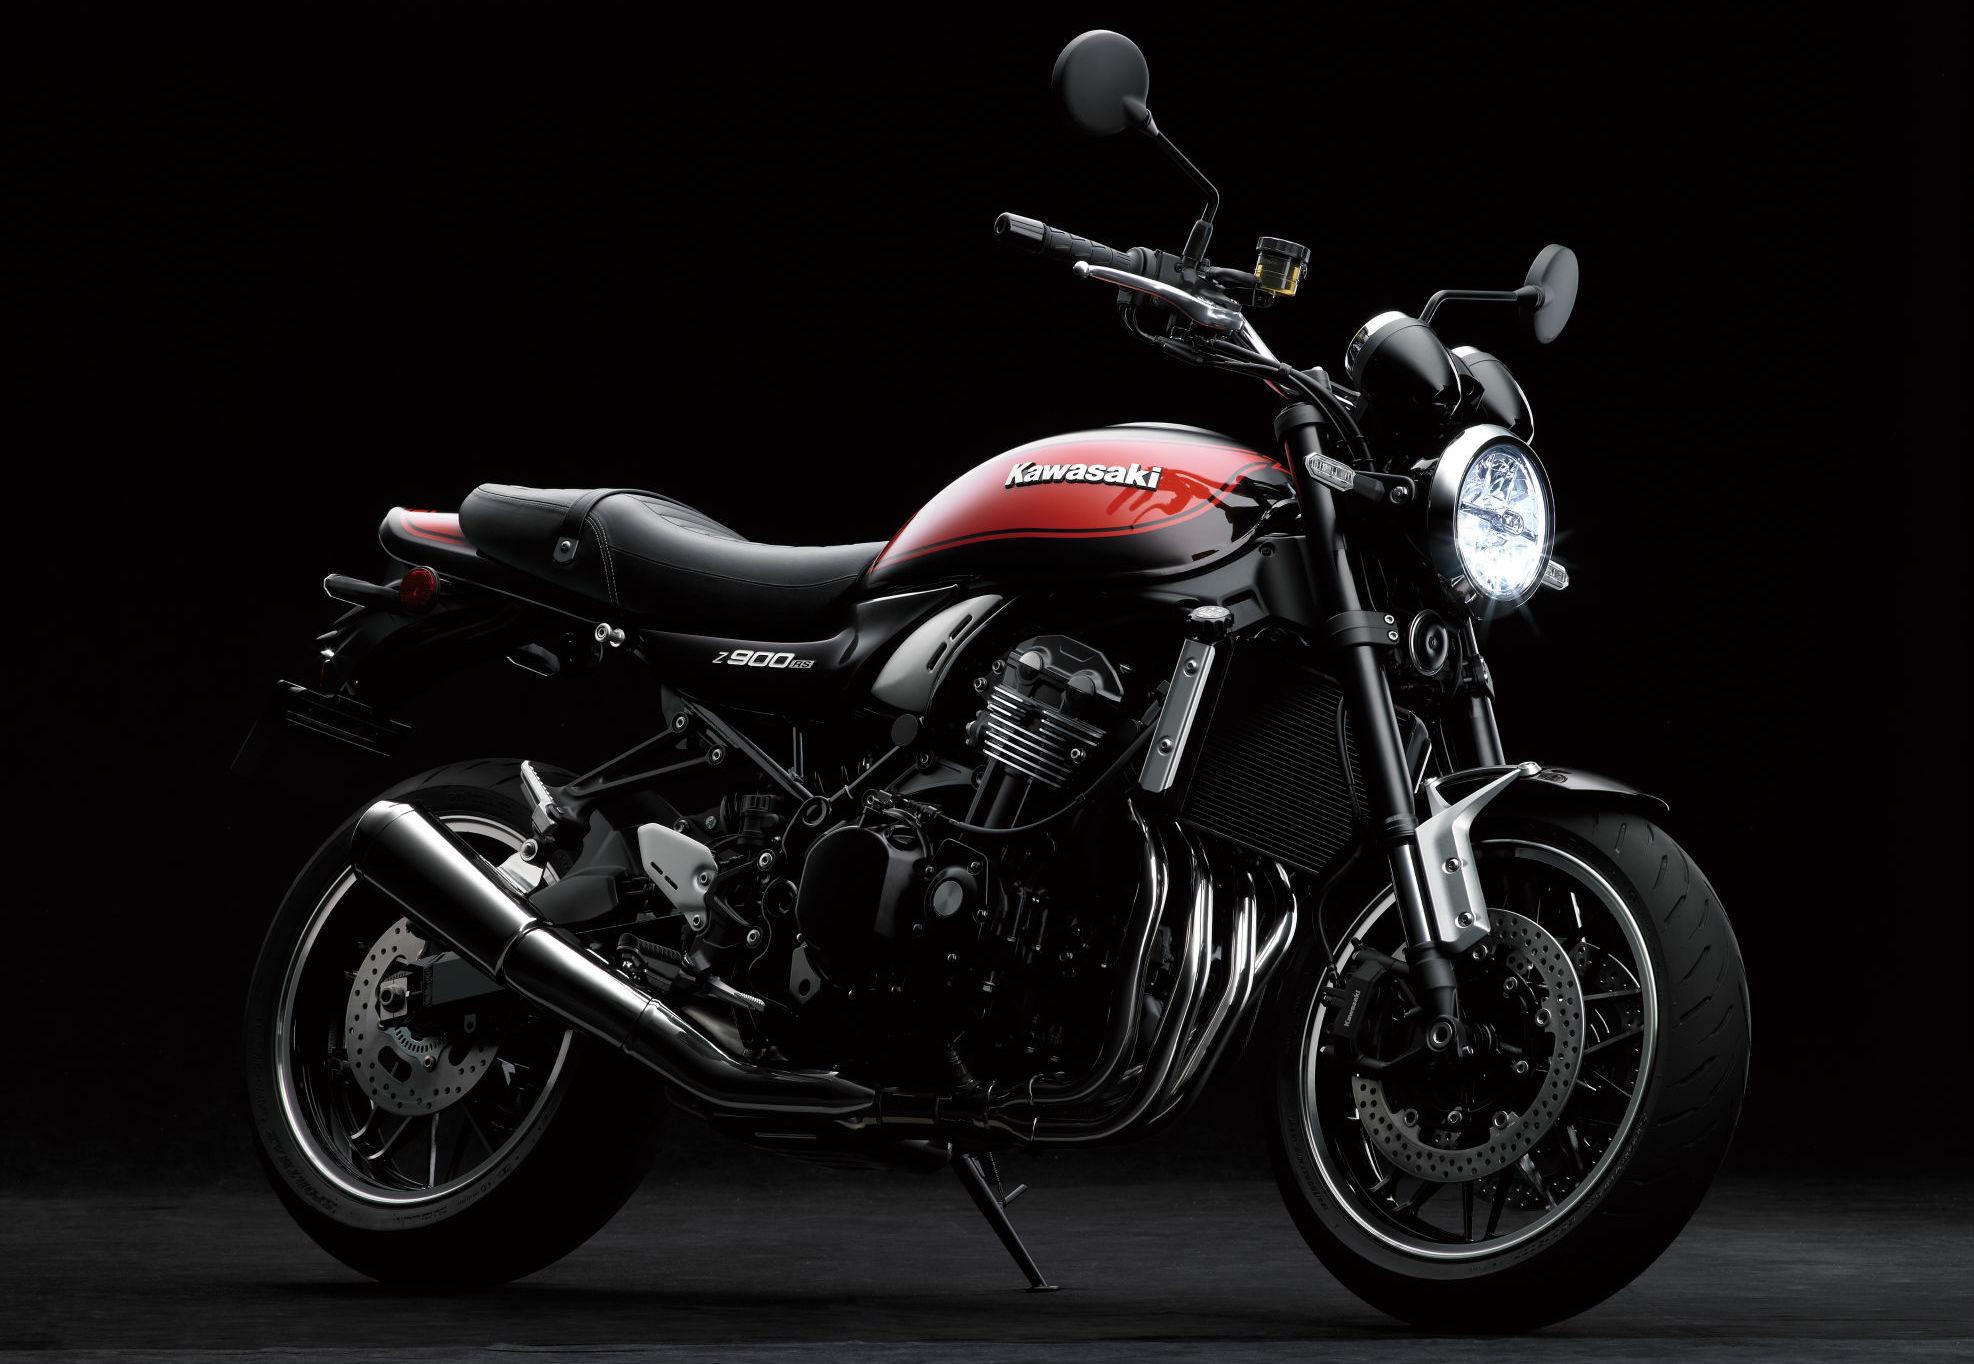 2018 Kawasaki Z900 RS Retro Sports Bike Unveiled